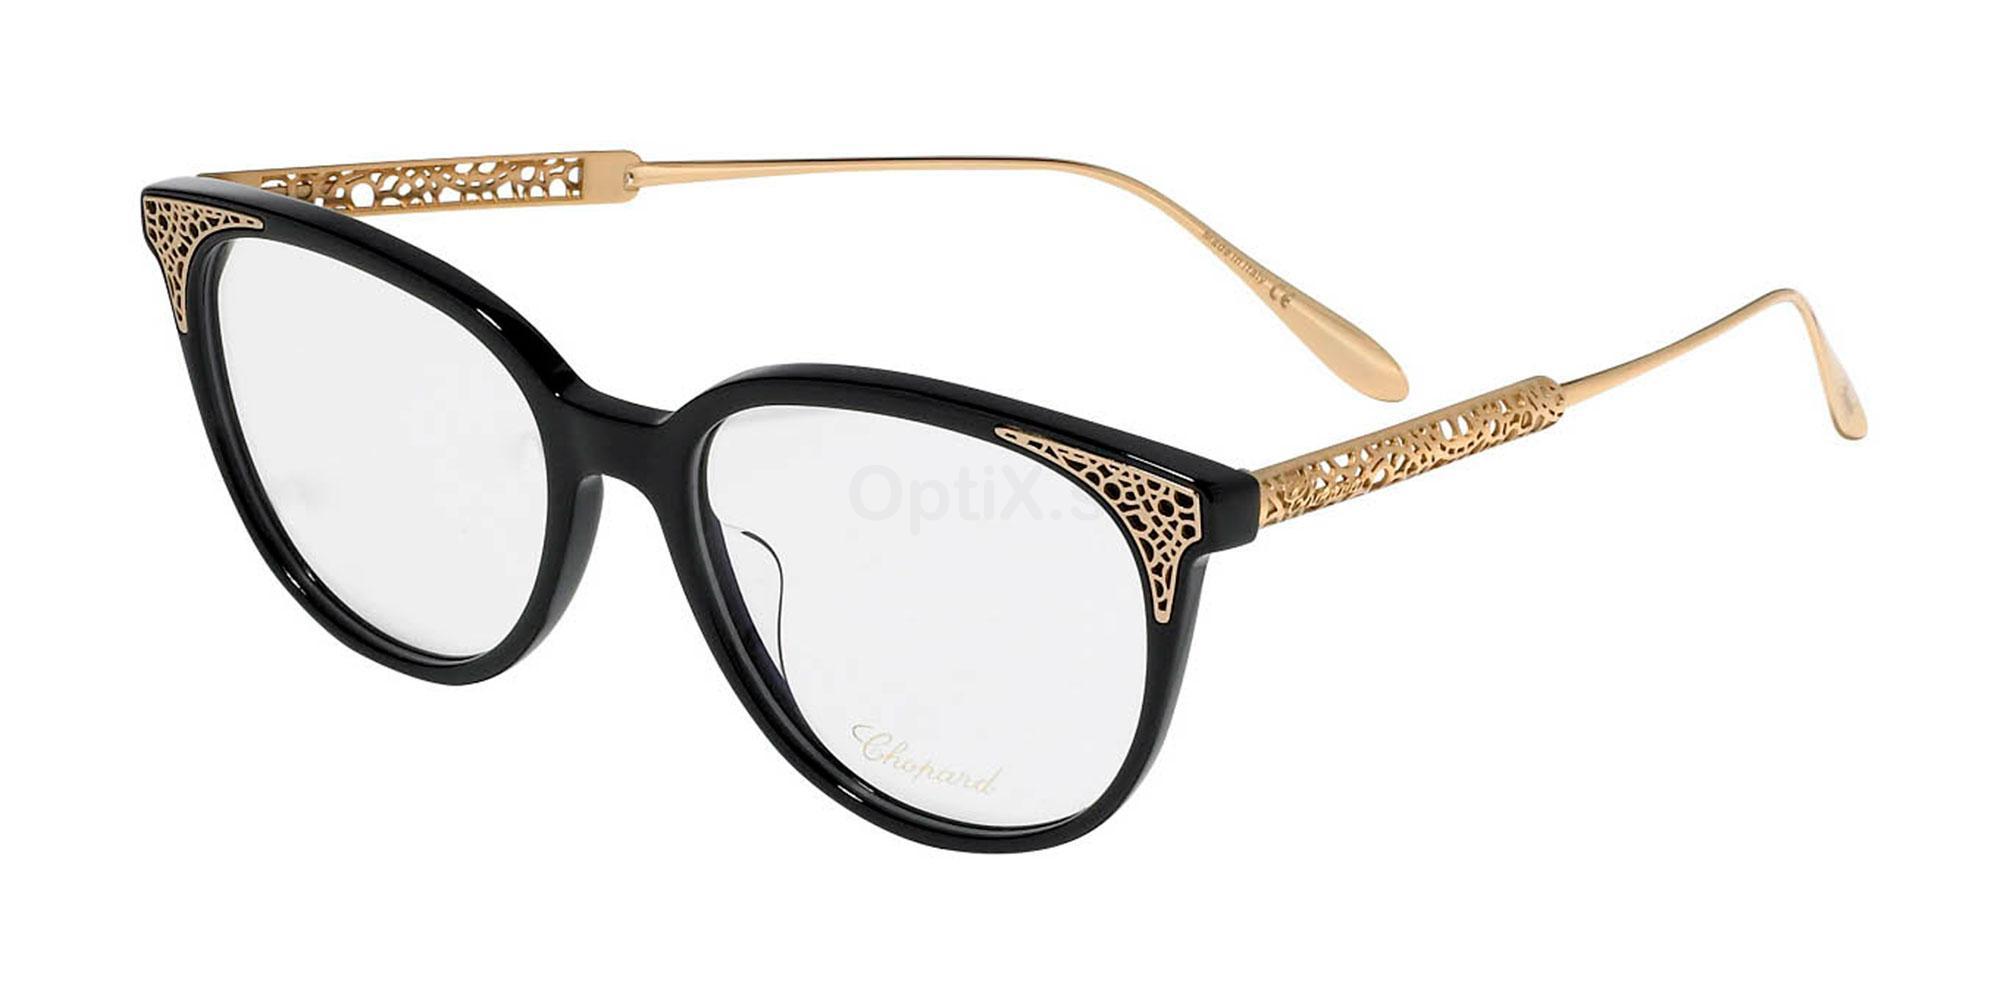 0700 VCH253 Glasses, Chopard